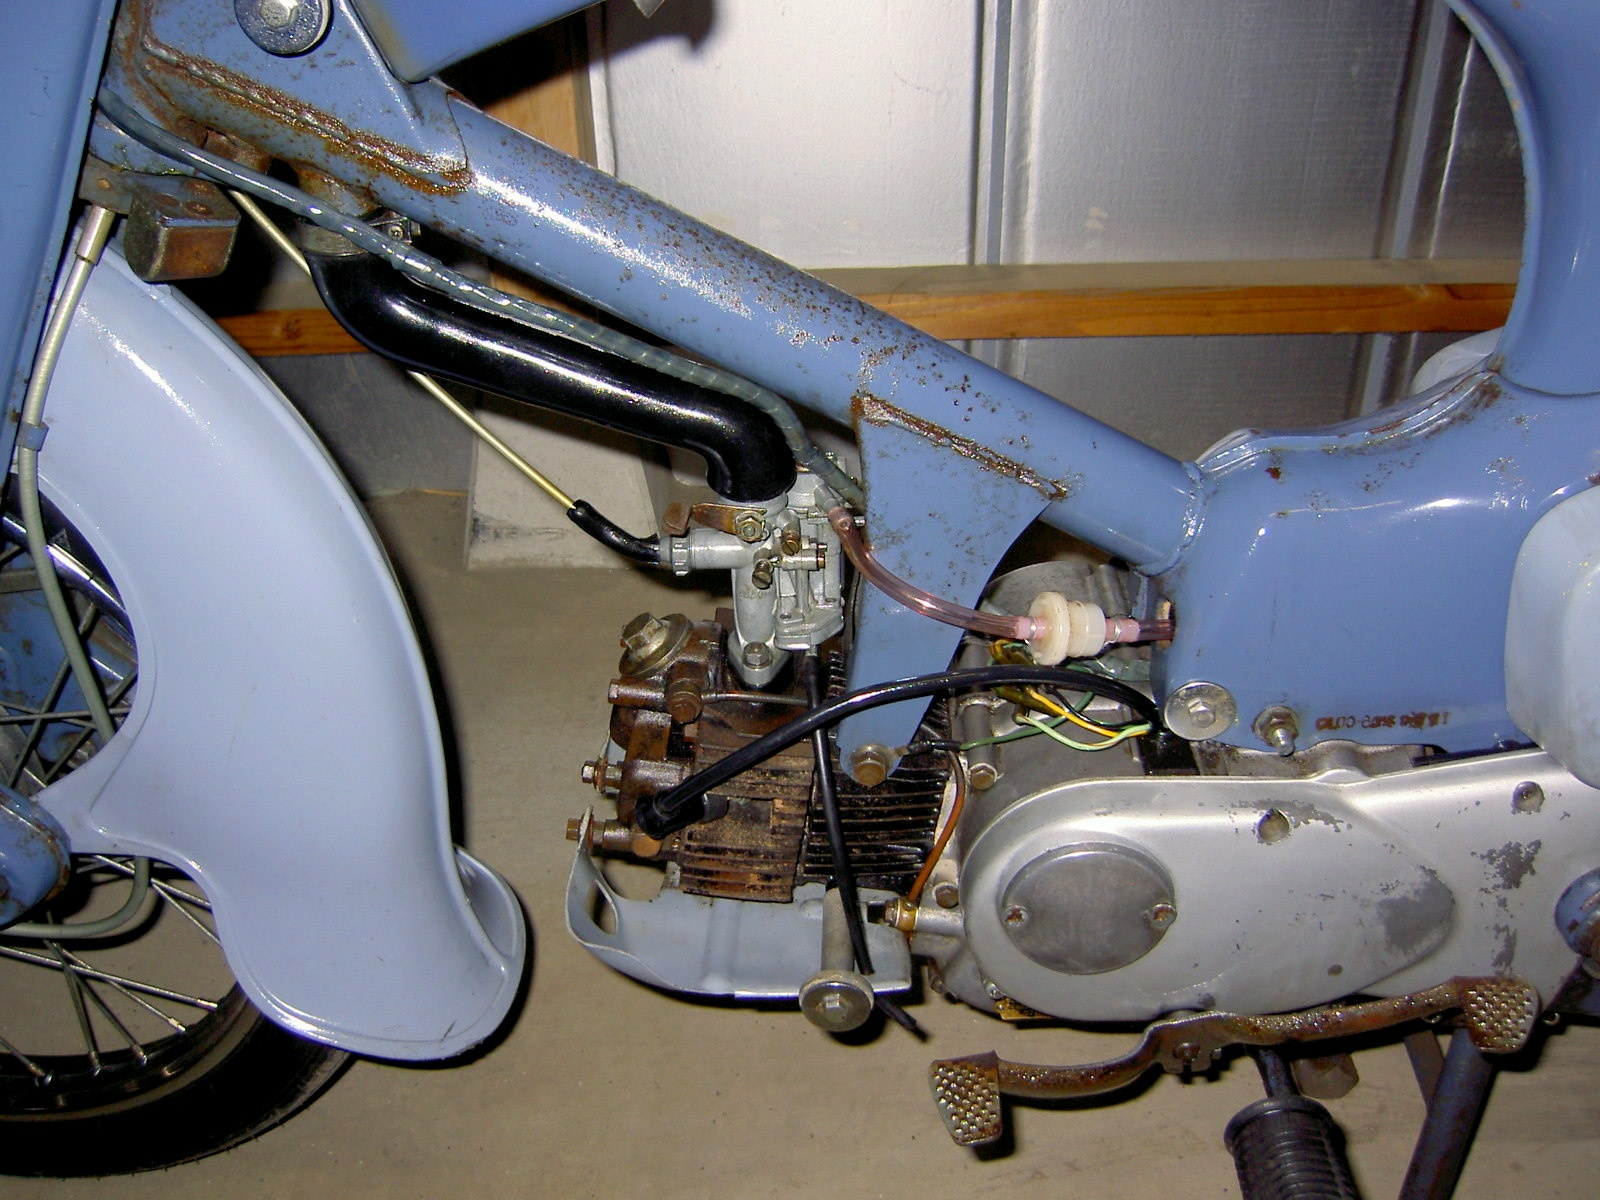 Granddaddy 1960 Honda Super Cub 50